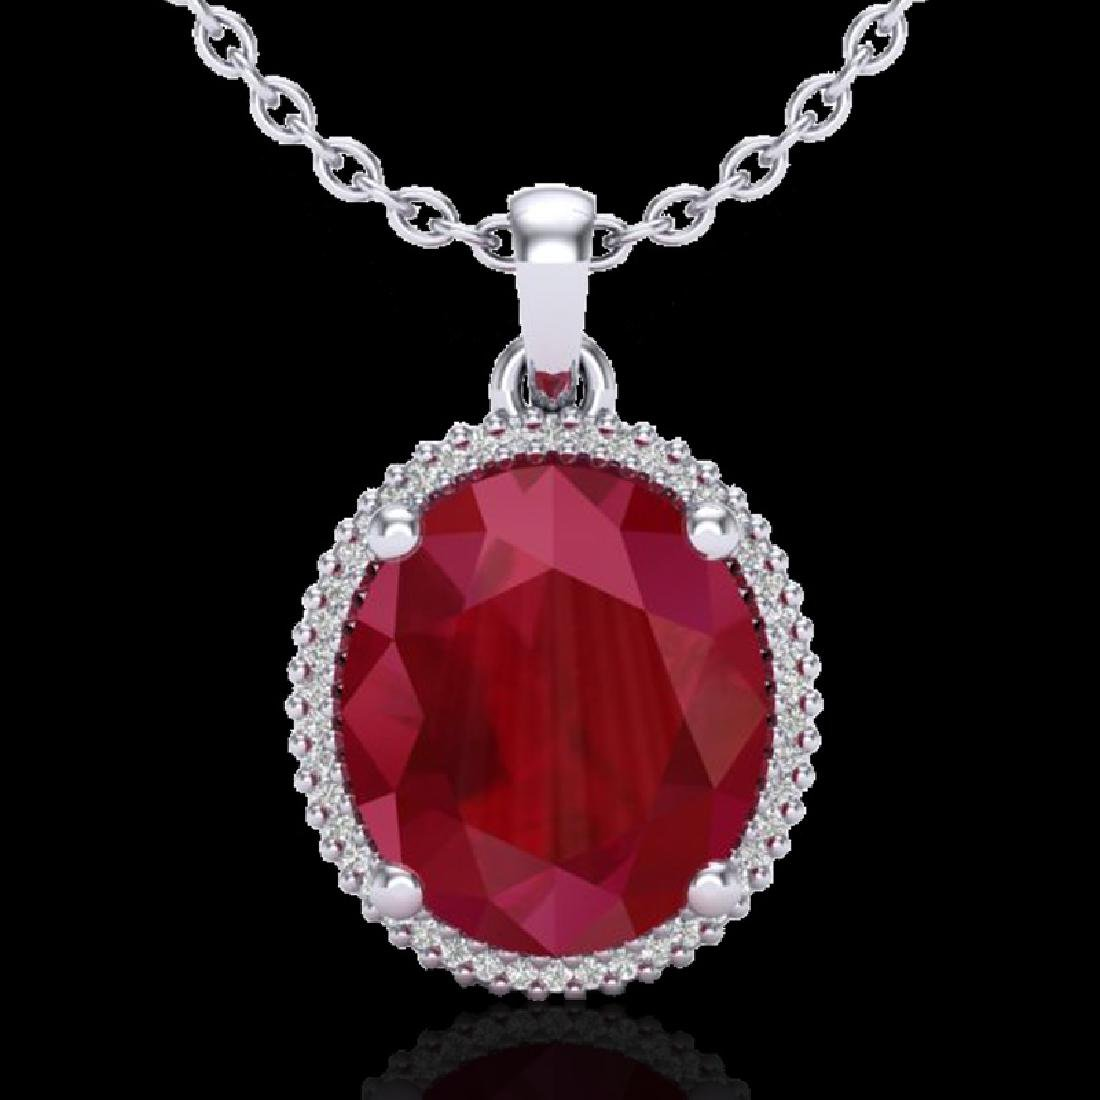 12 CTW Ruby & Micro Pave VS/SI Diamond Halo Necklace